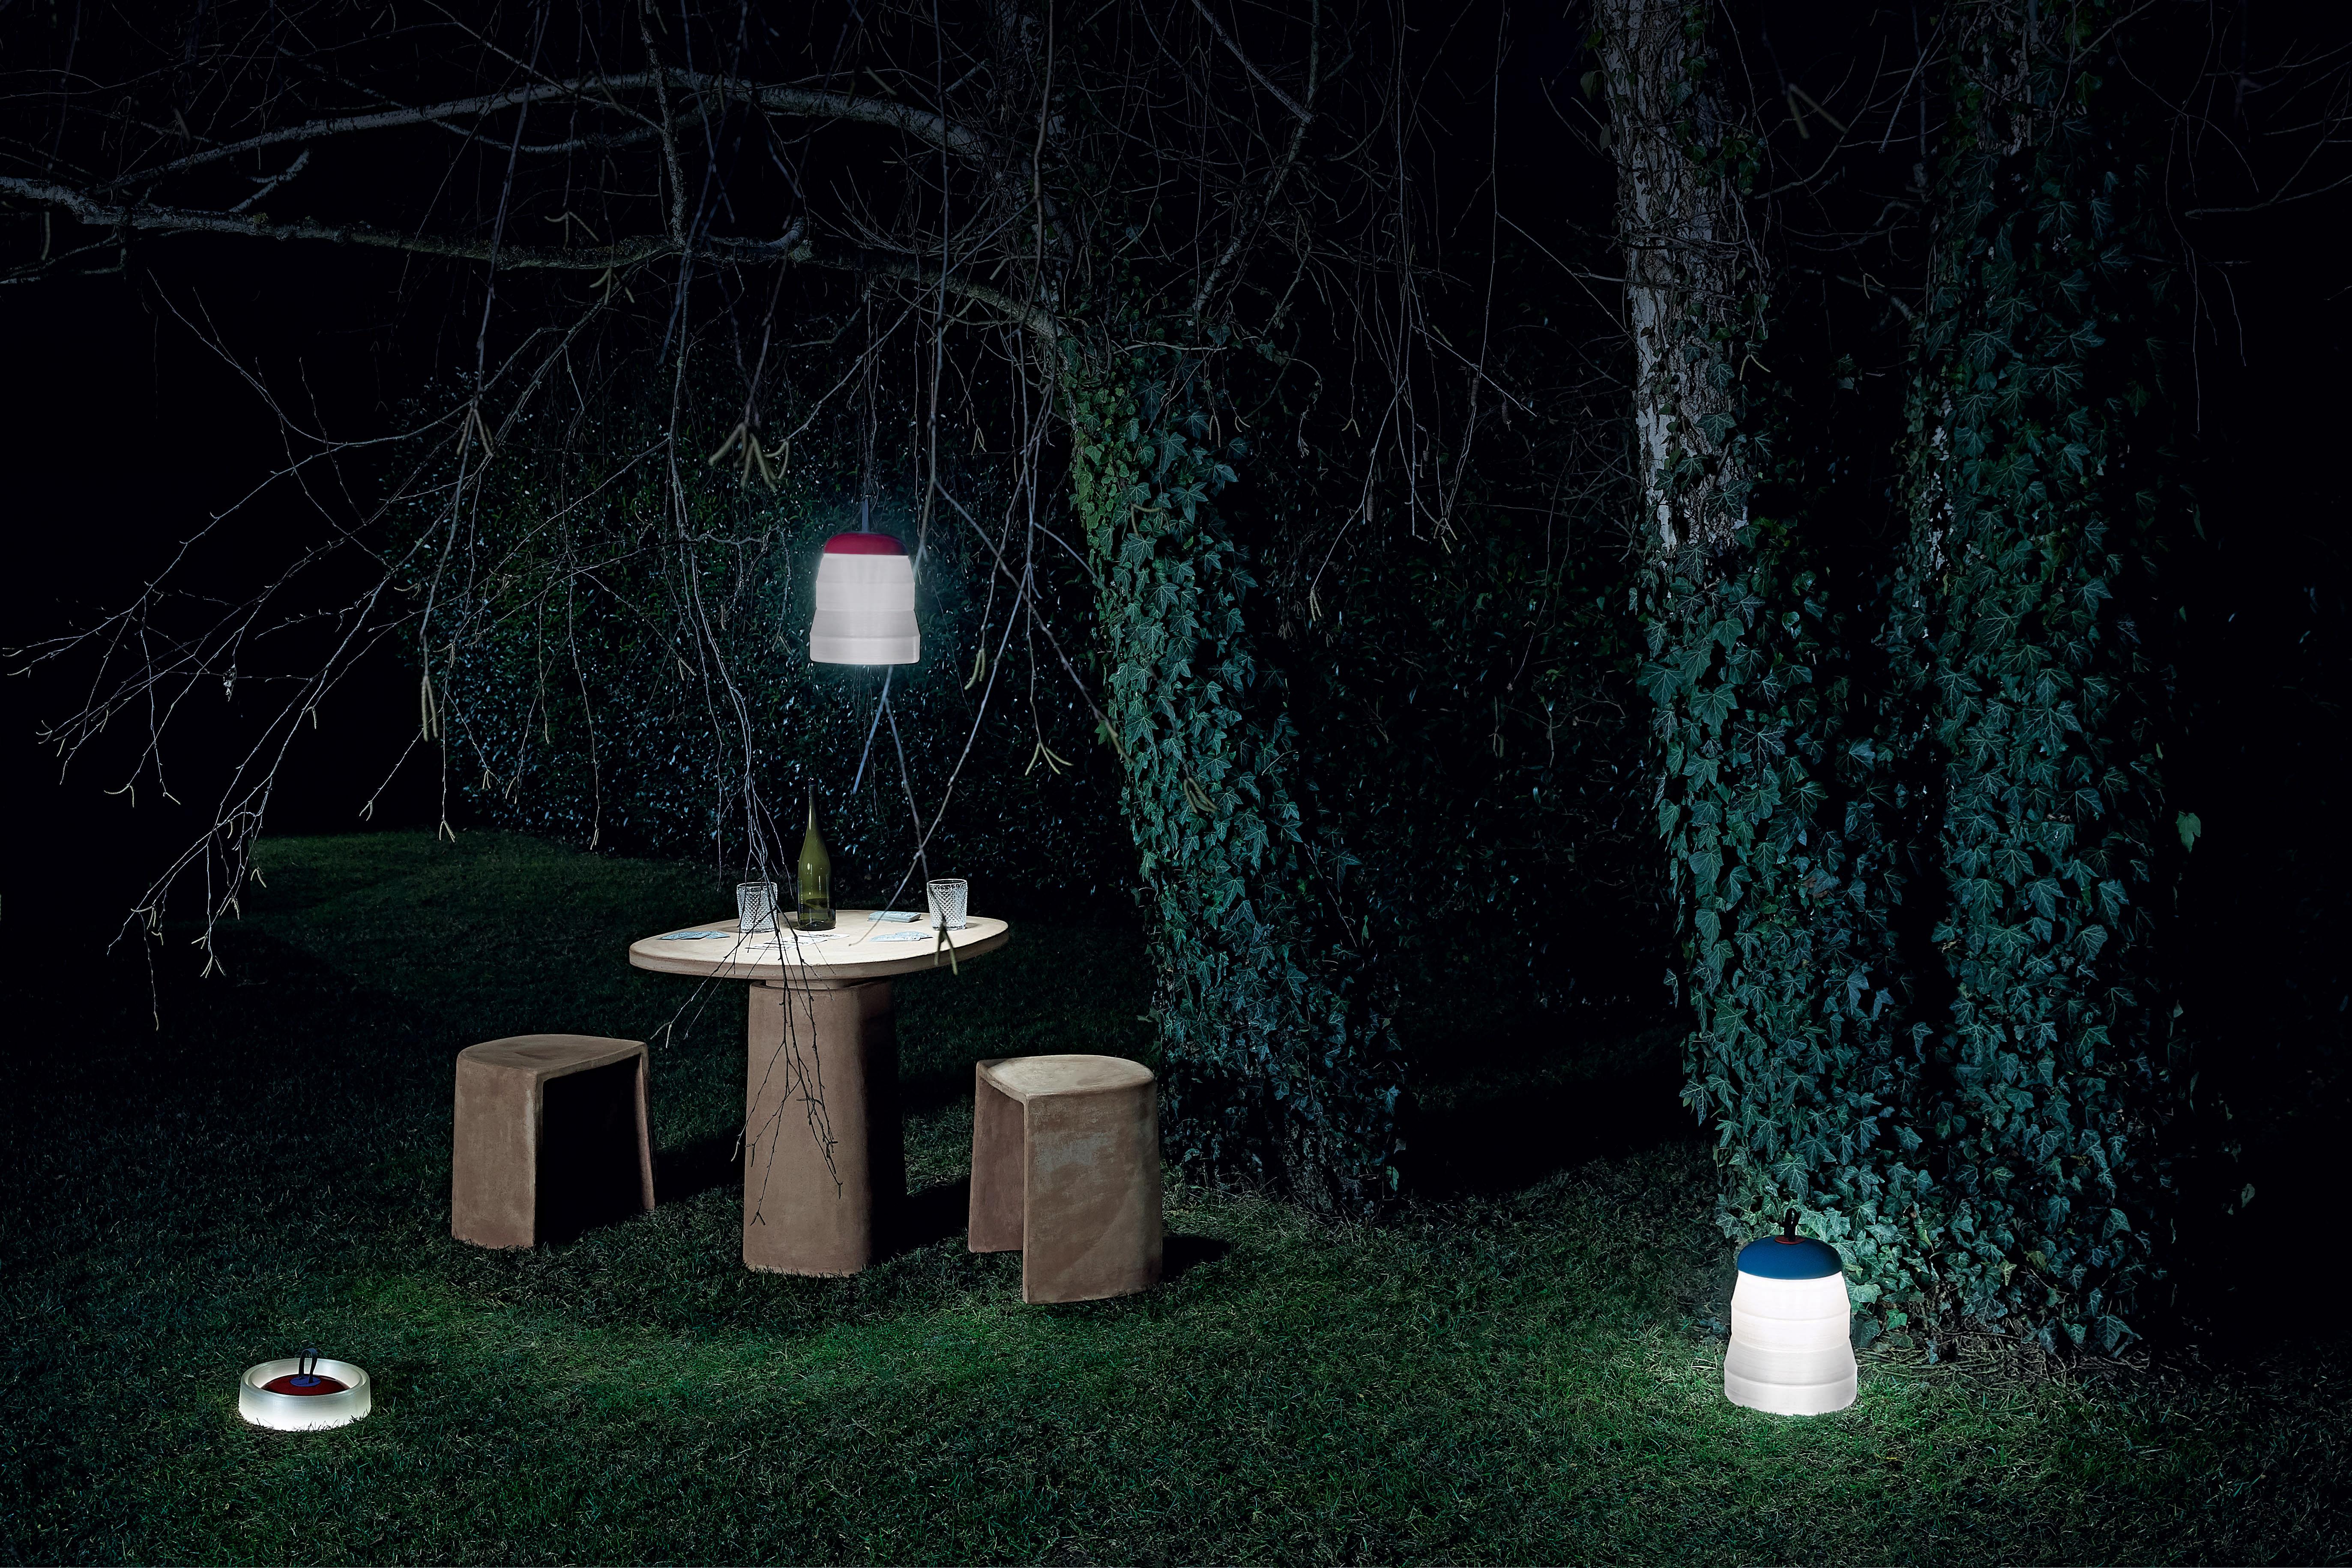 Lampe Ohne Kabel Cri Cri LED Outdoor Von Foscarini